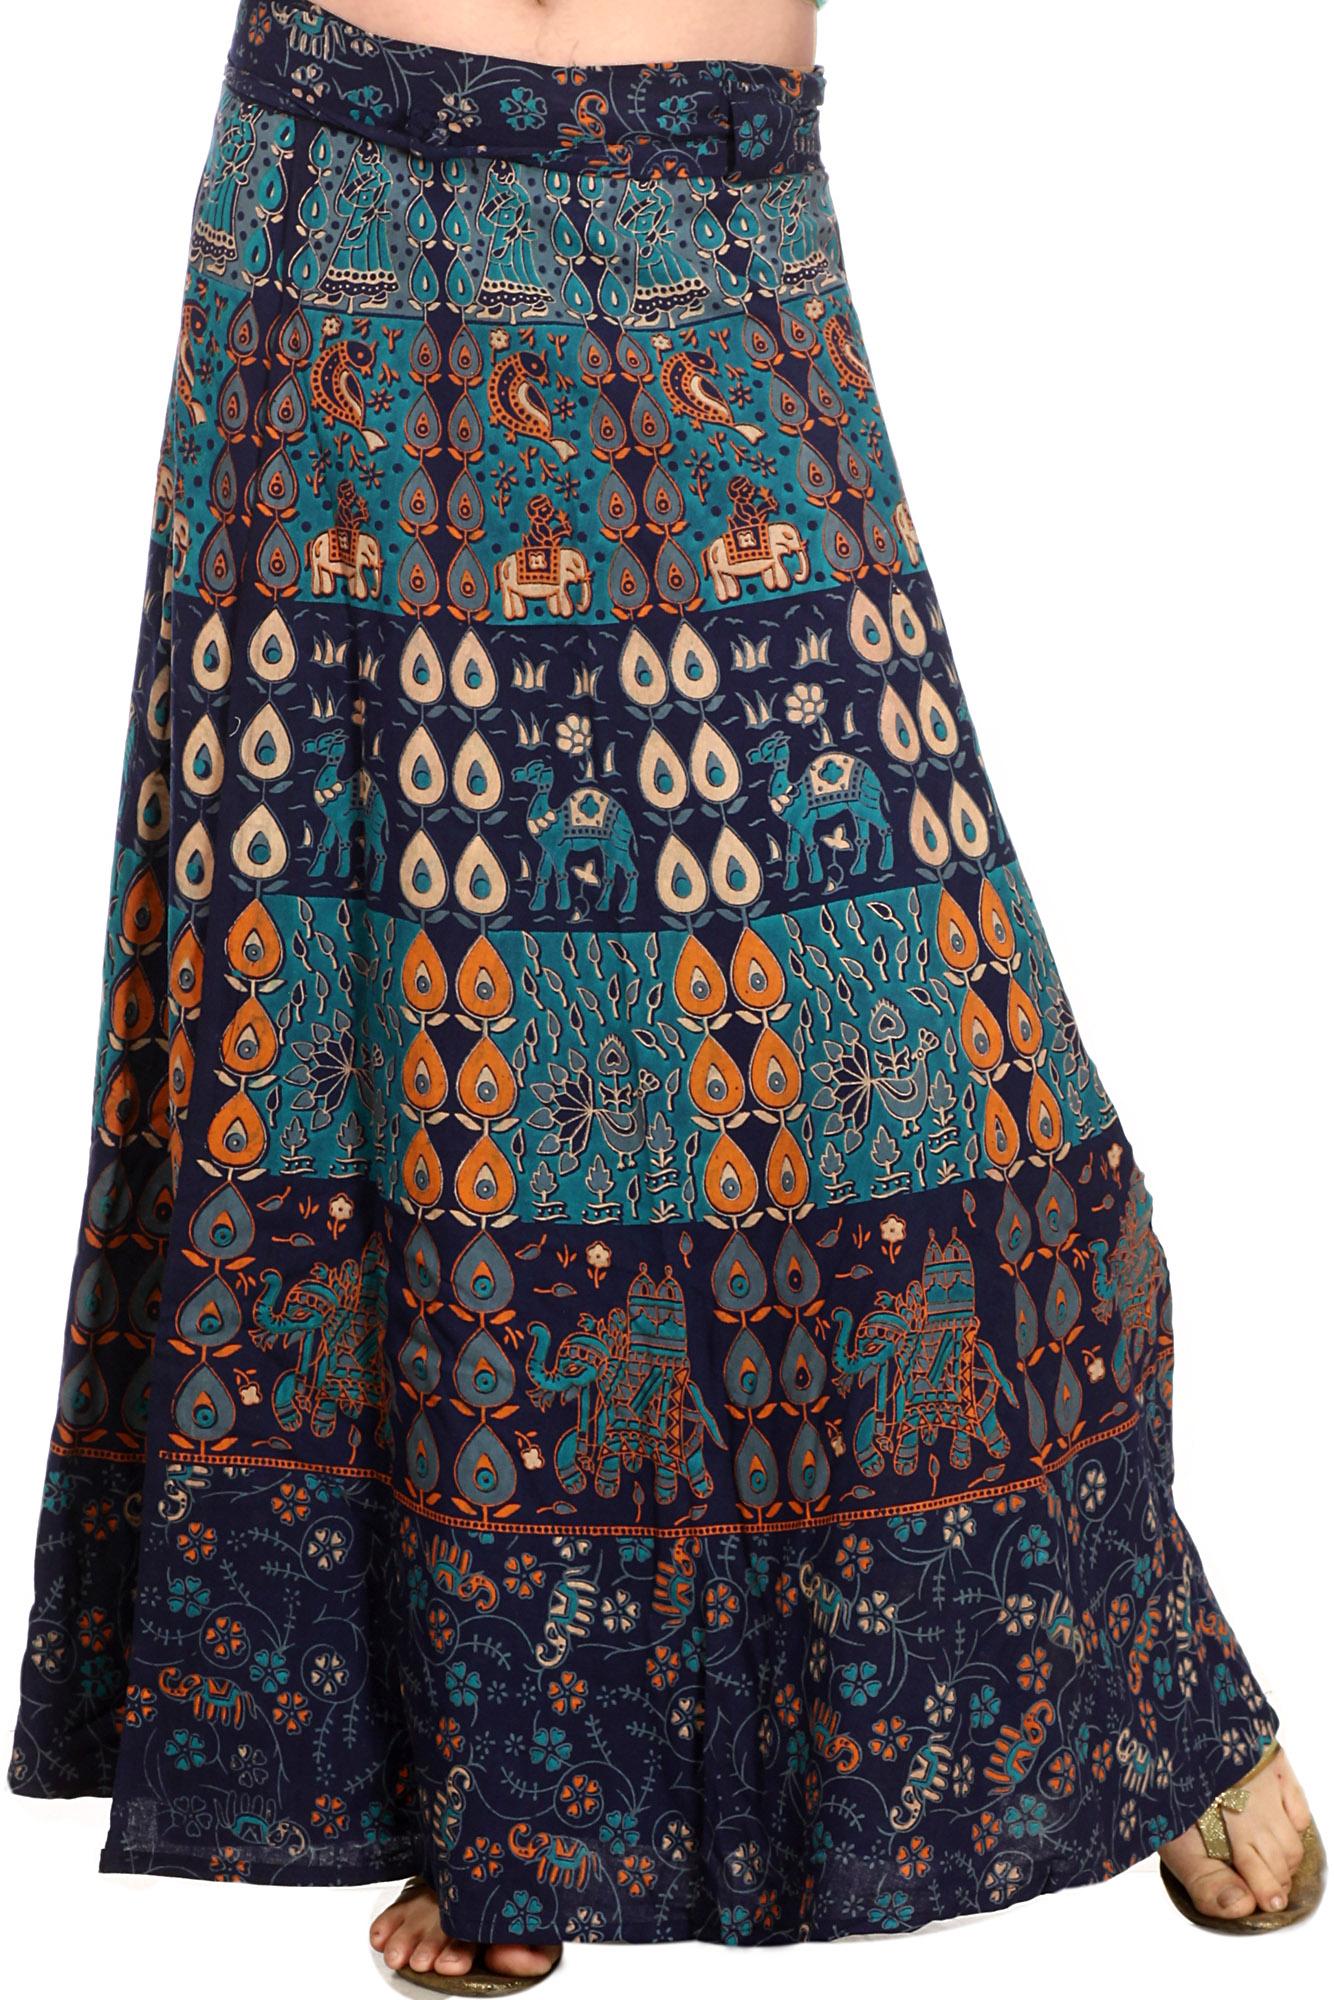 navyblue wraparound long skirt with printed elephants